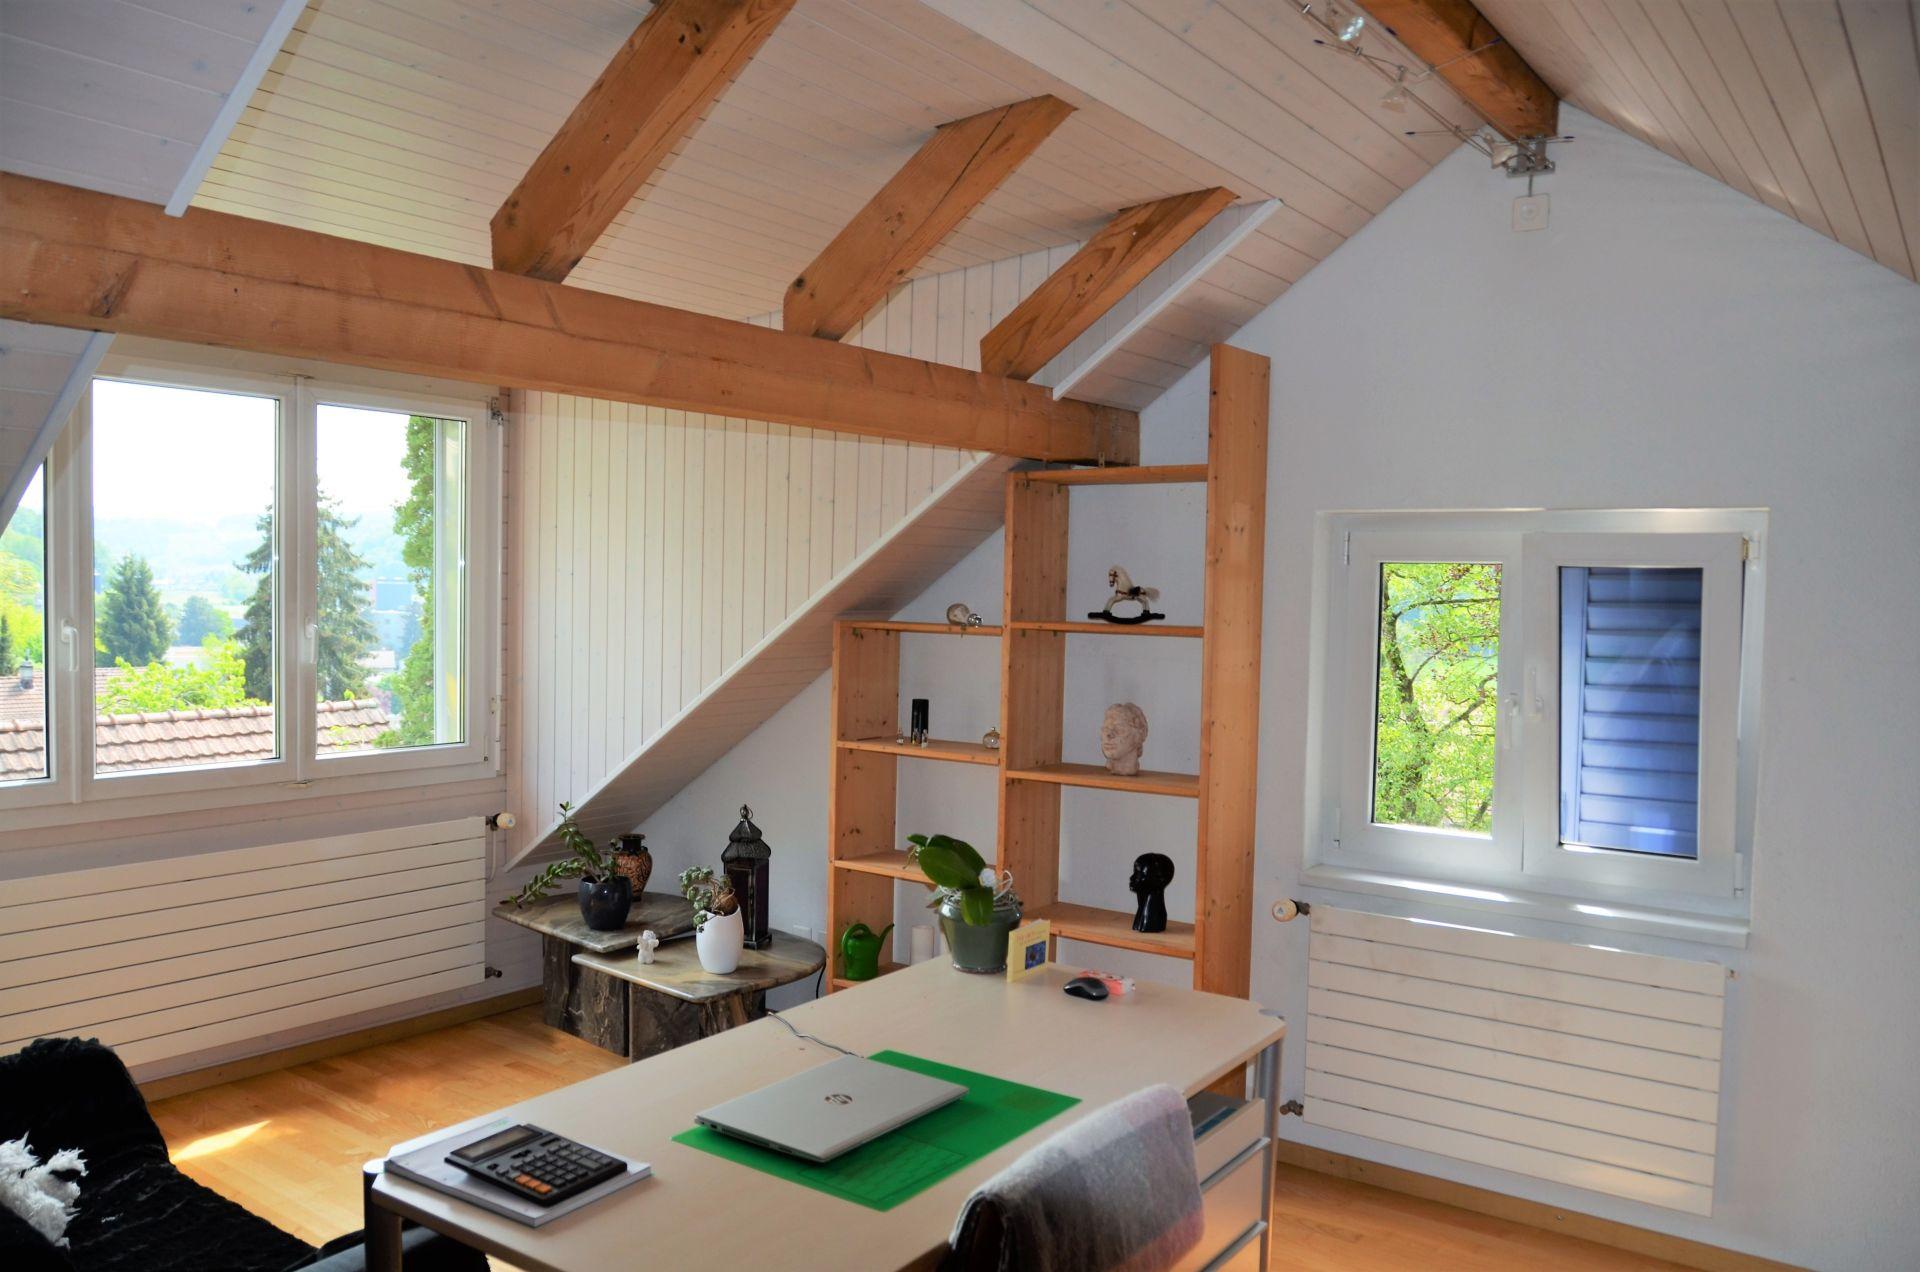 ausgebautes Dachgeschoss mit Lukarne